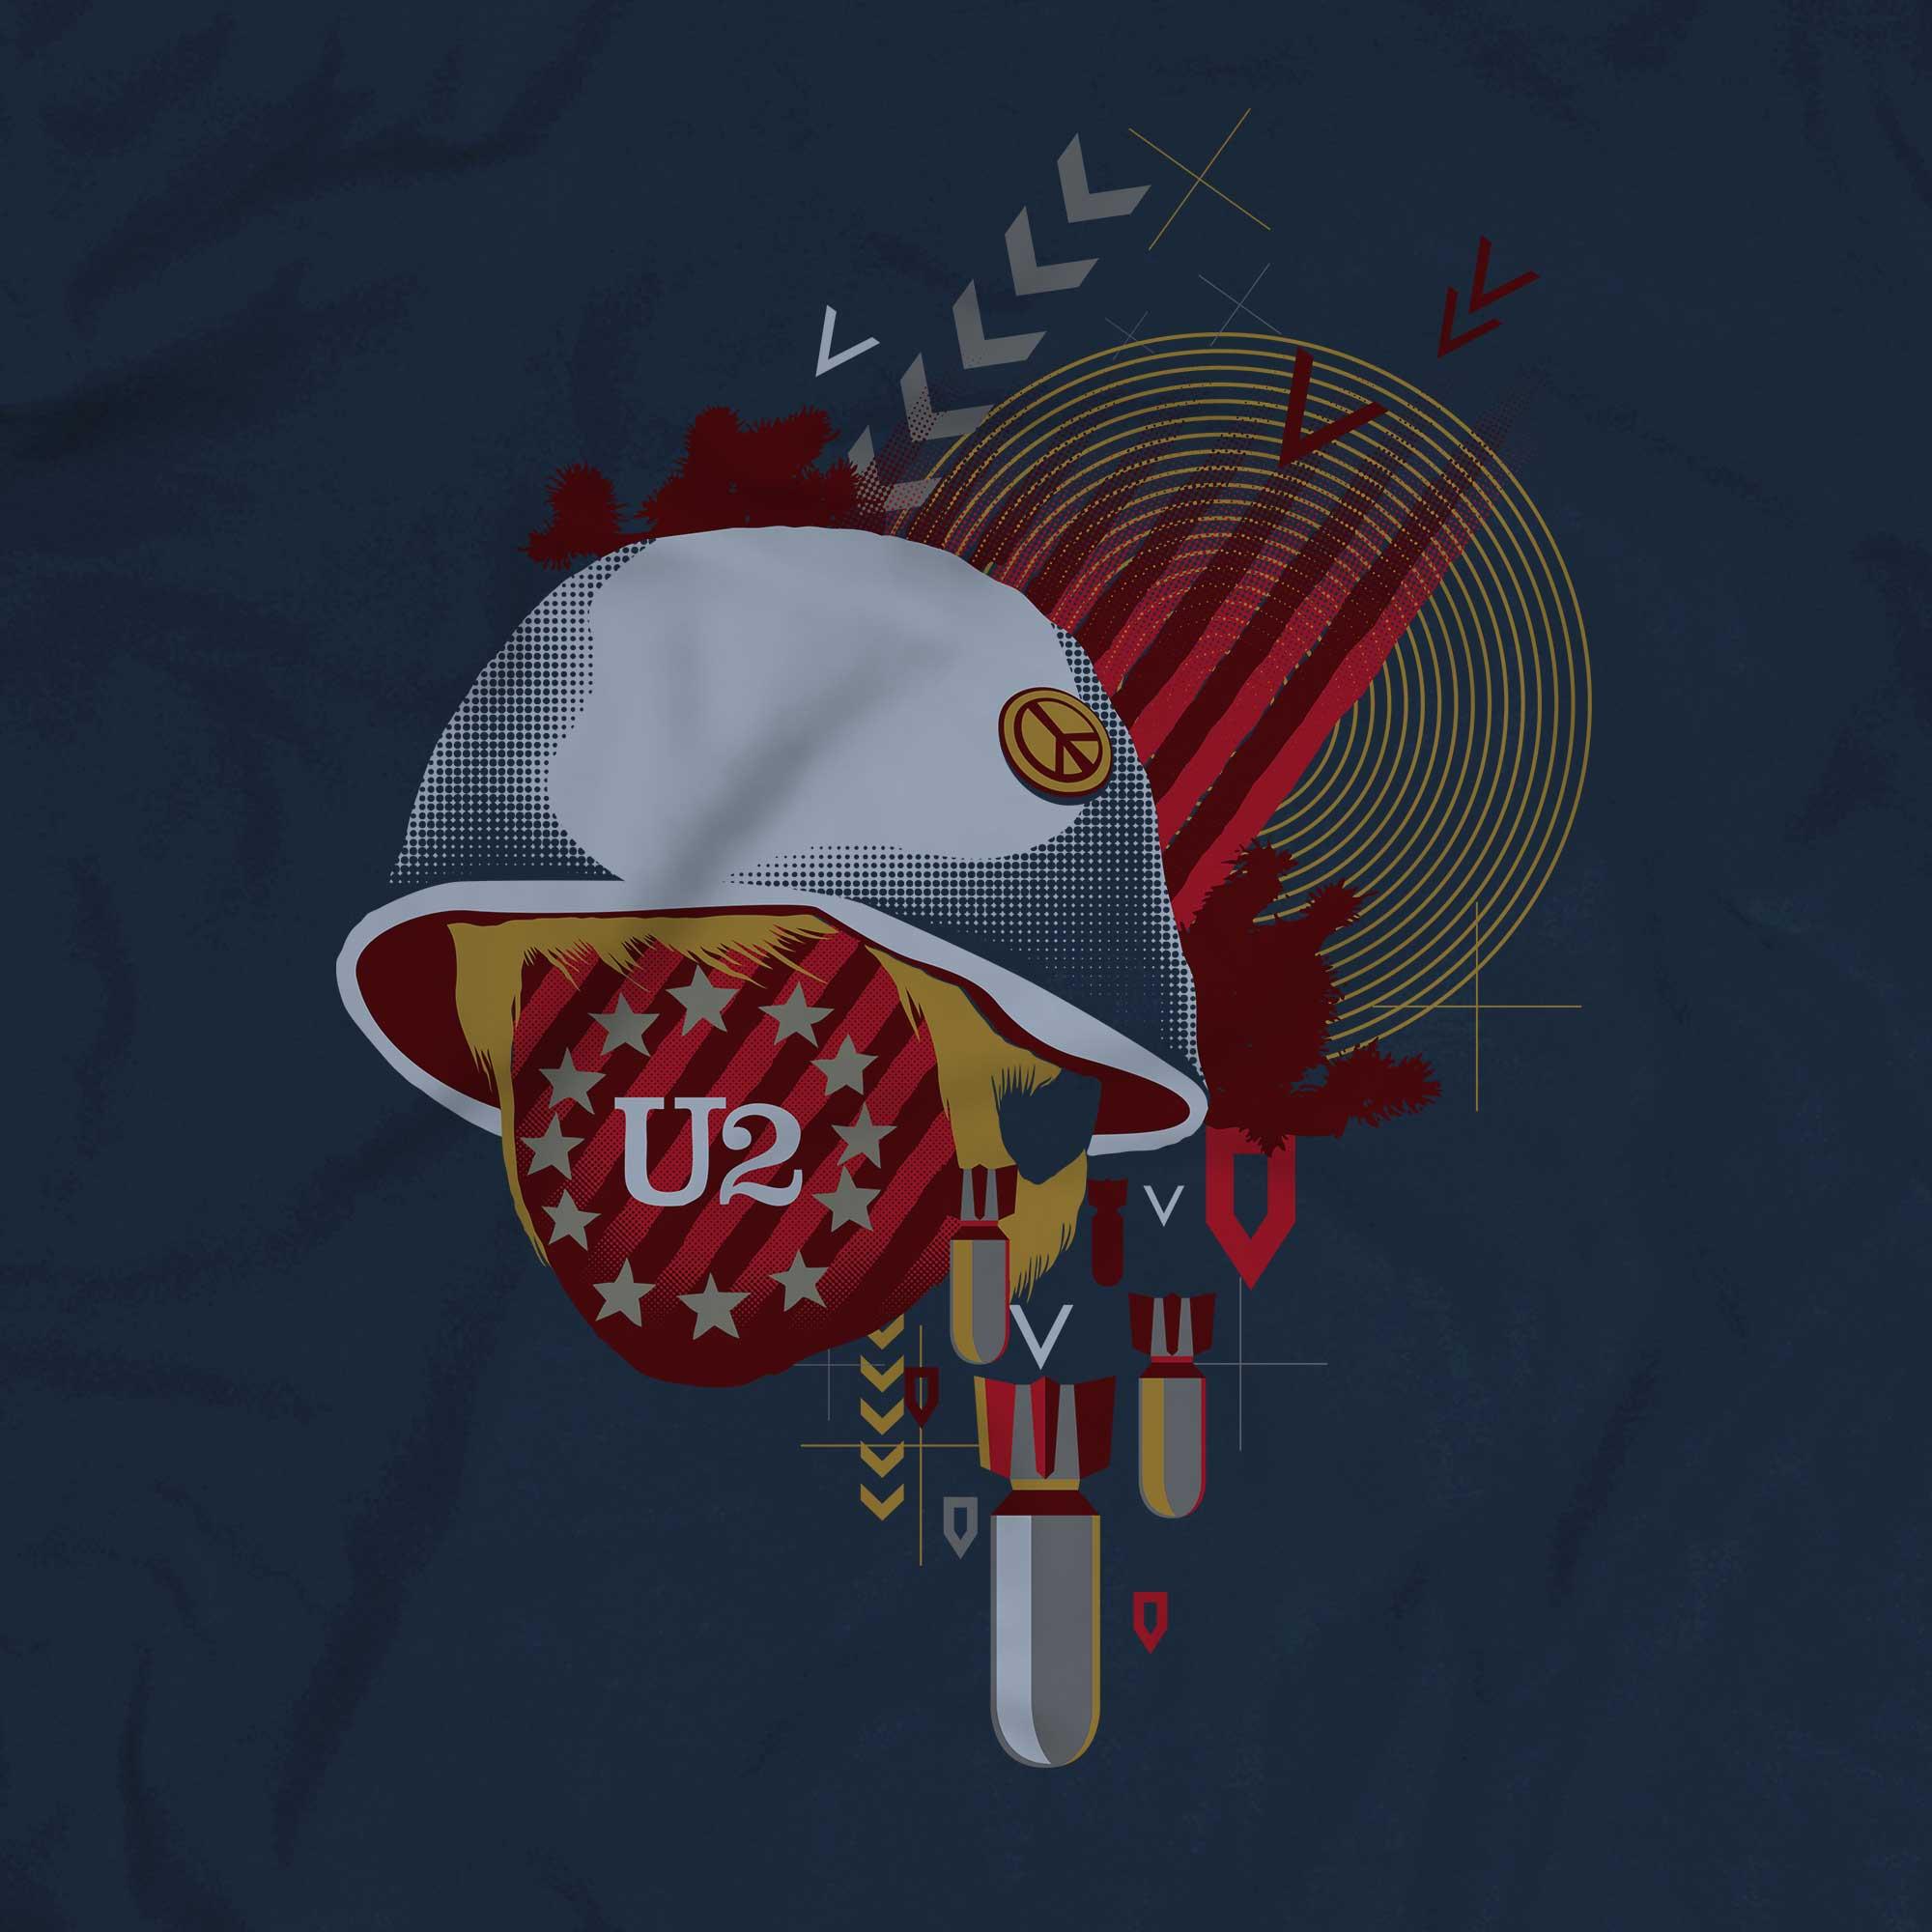 Camiseta U2 - Masculino